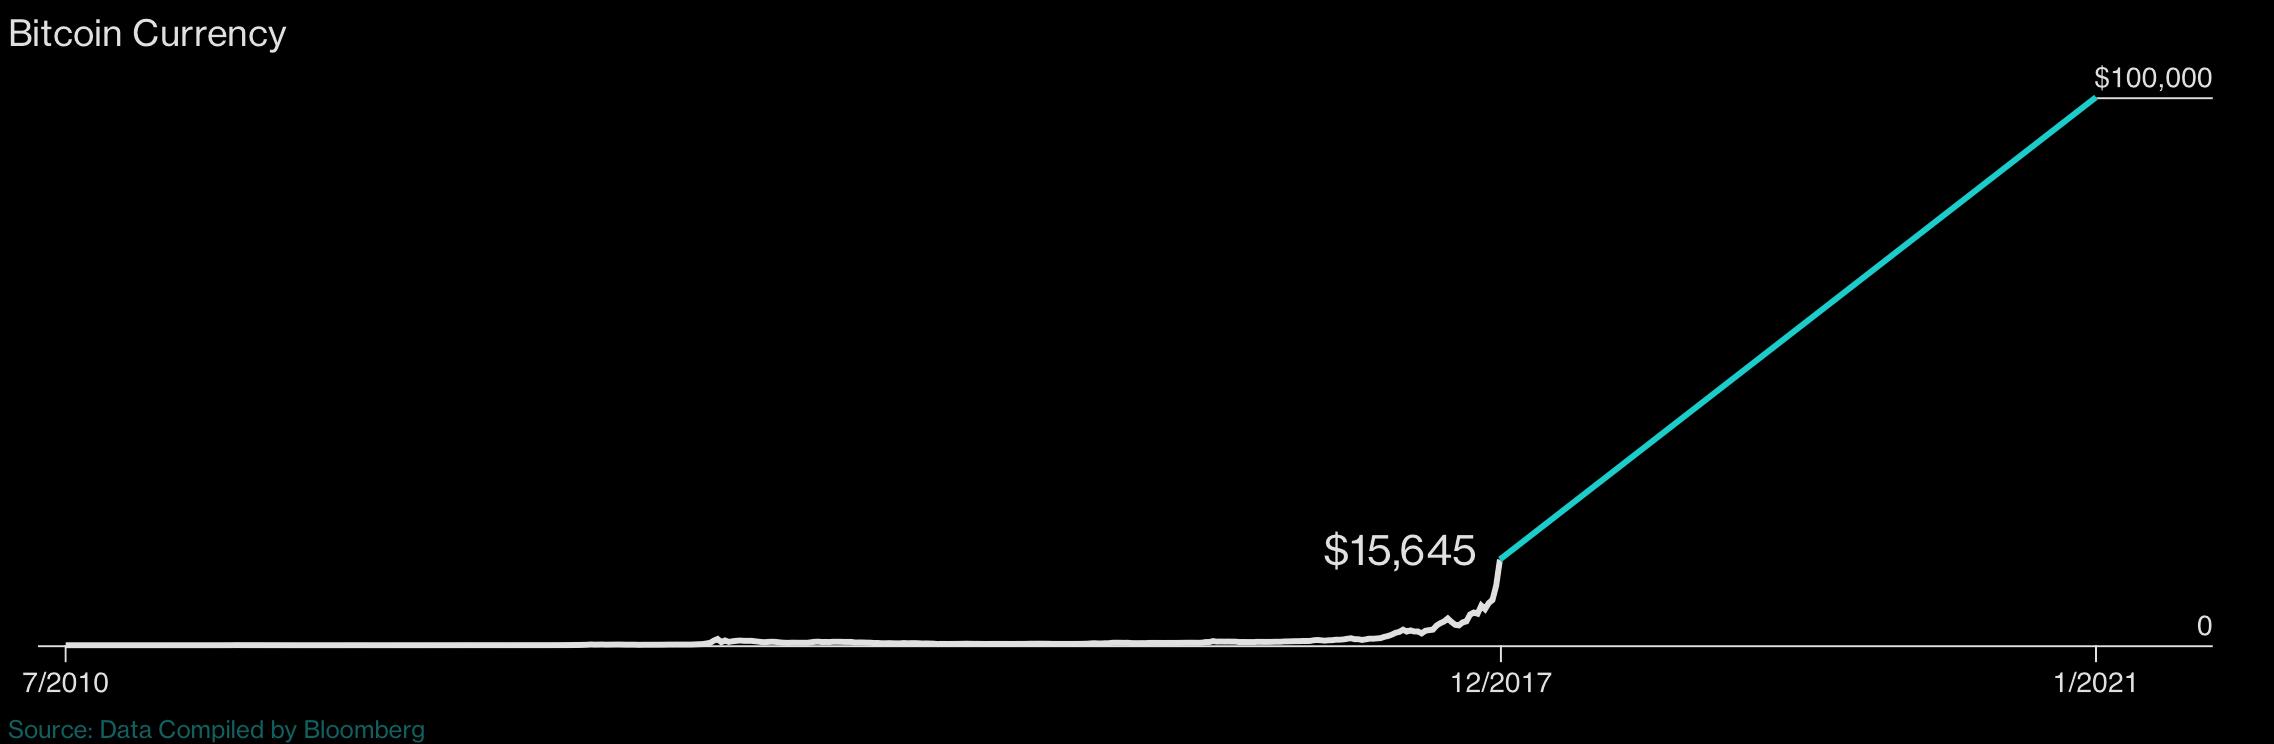 Bitcoin Currency, Jul 2010 - Dec 2017